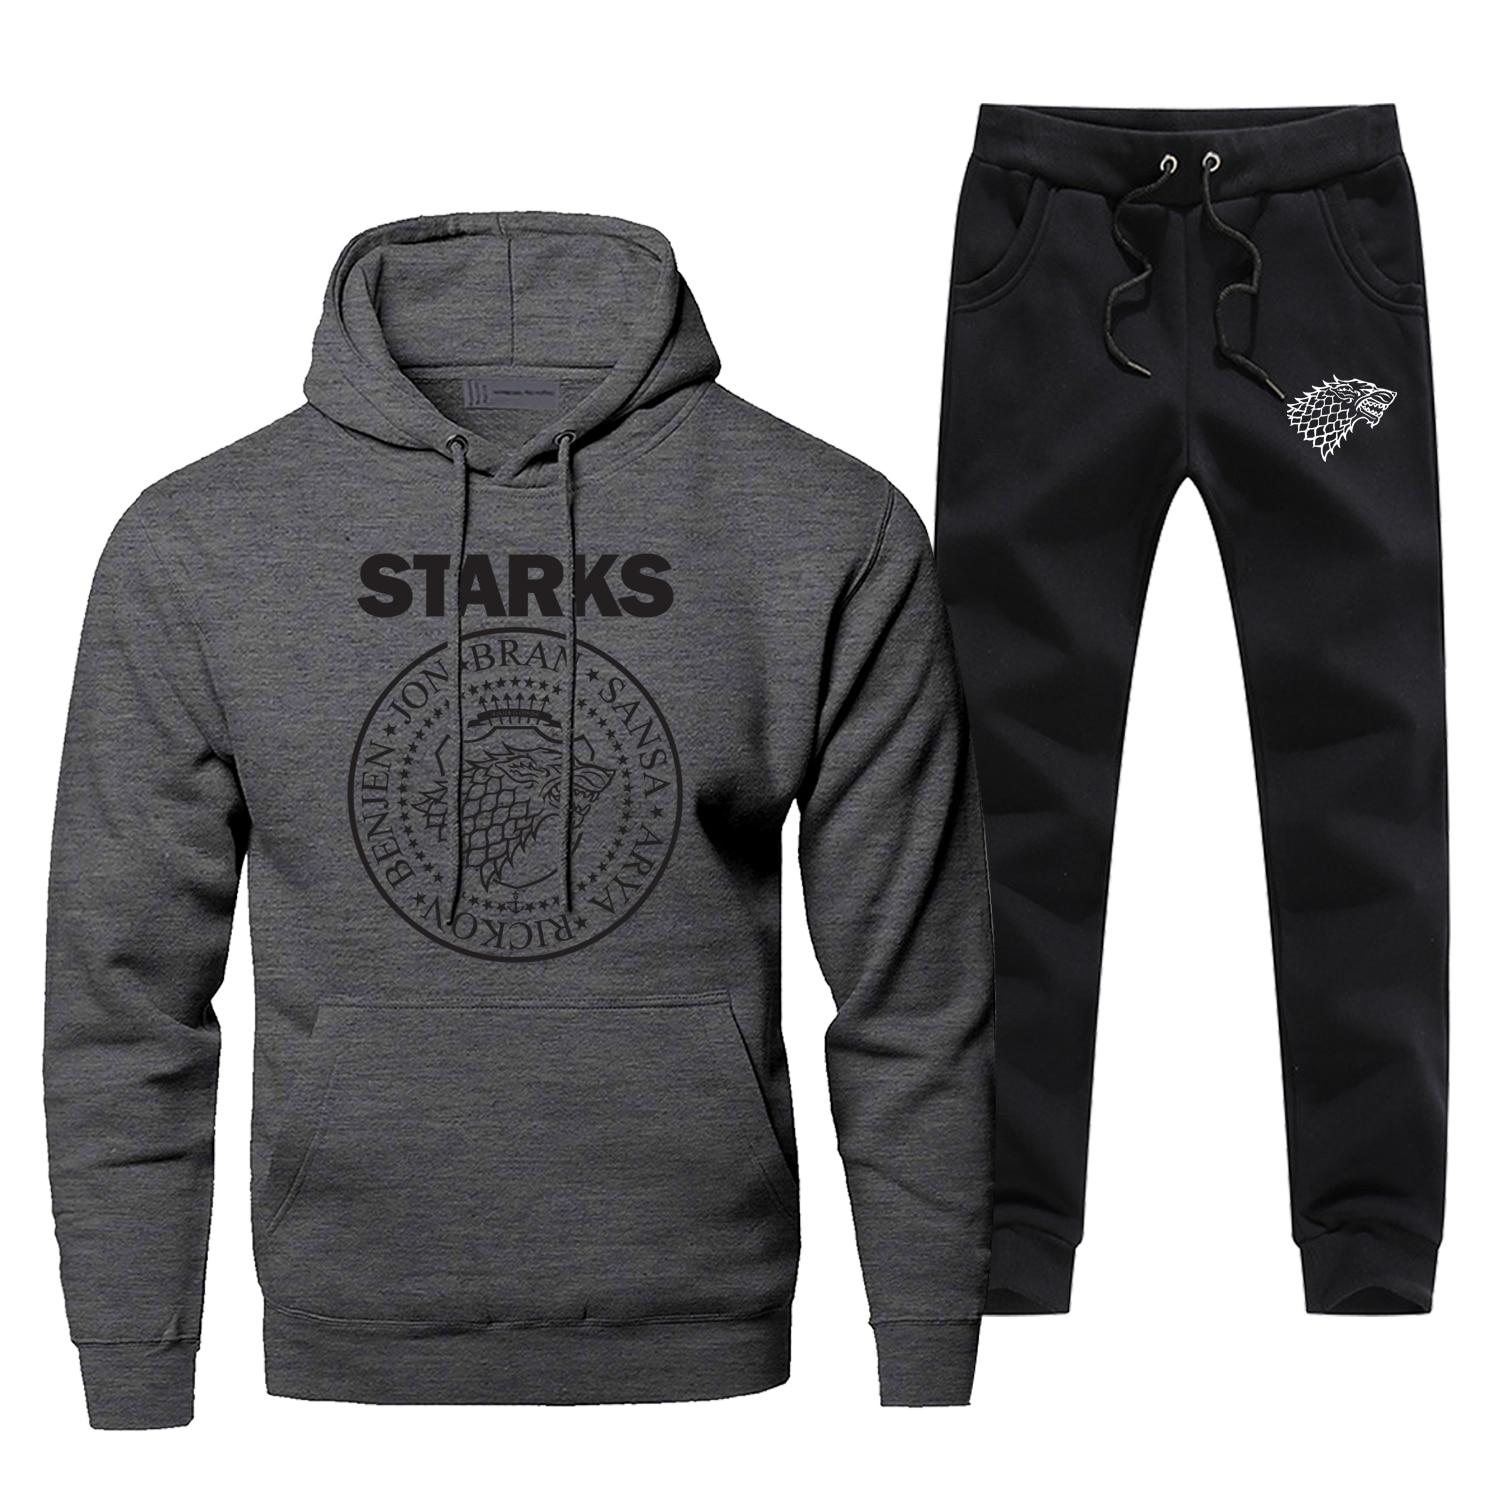 Game Of Thrones Sportsman Wear Fashion Comfortable House Stark Male Set Casual Hipster Wolf Arya Stark Pants Sweatshirt Men Suit